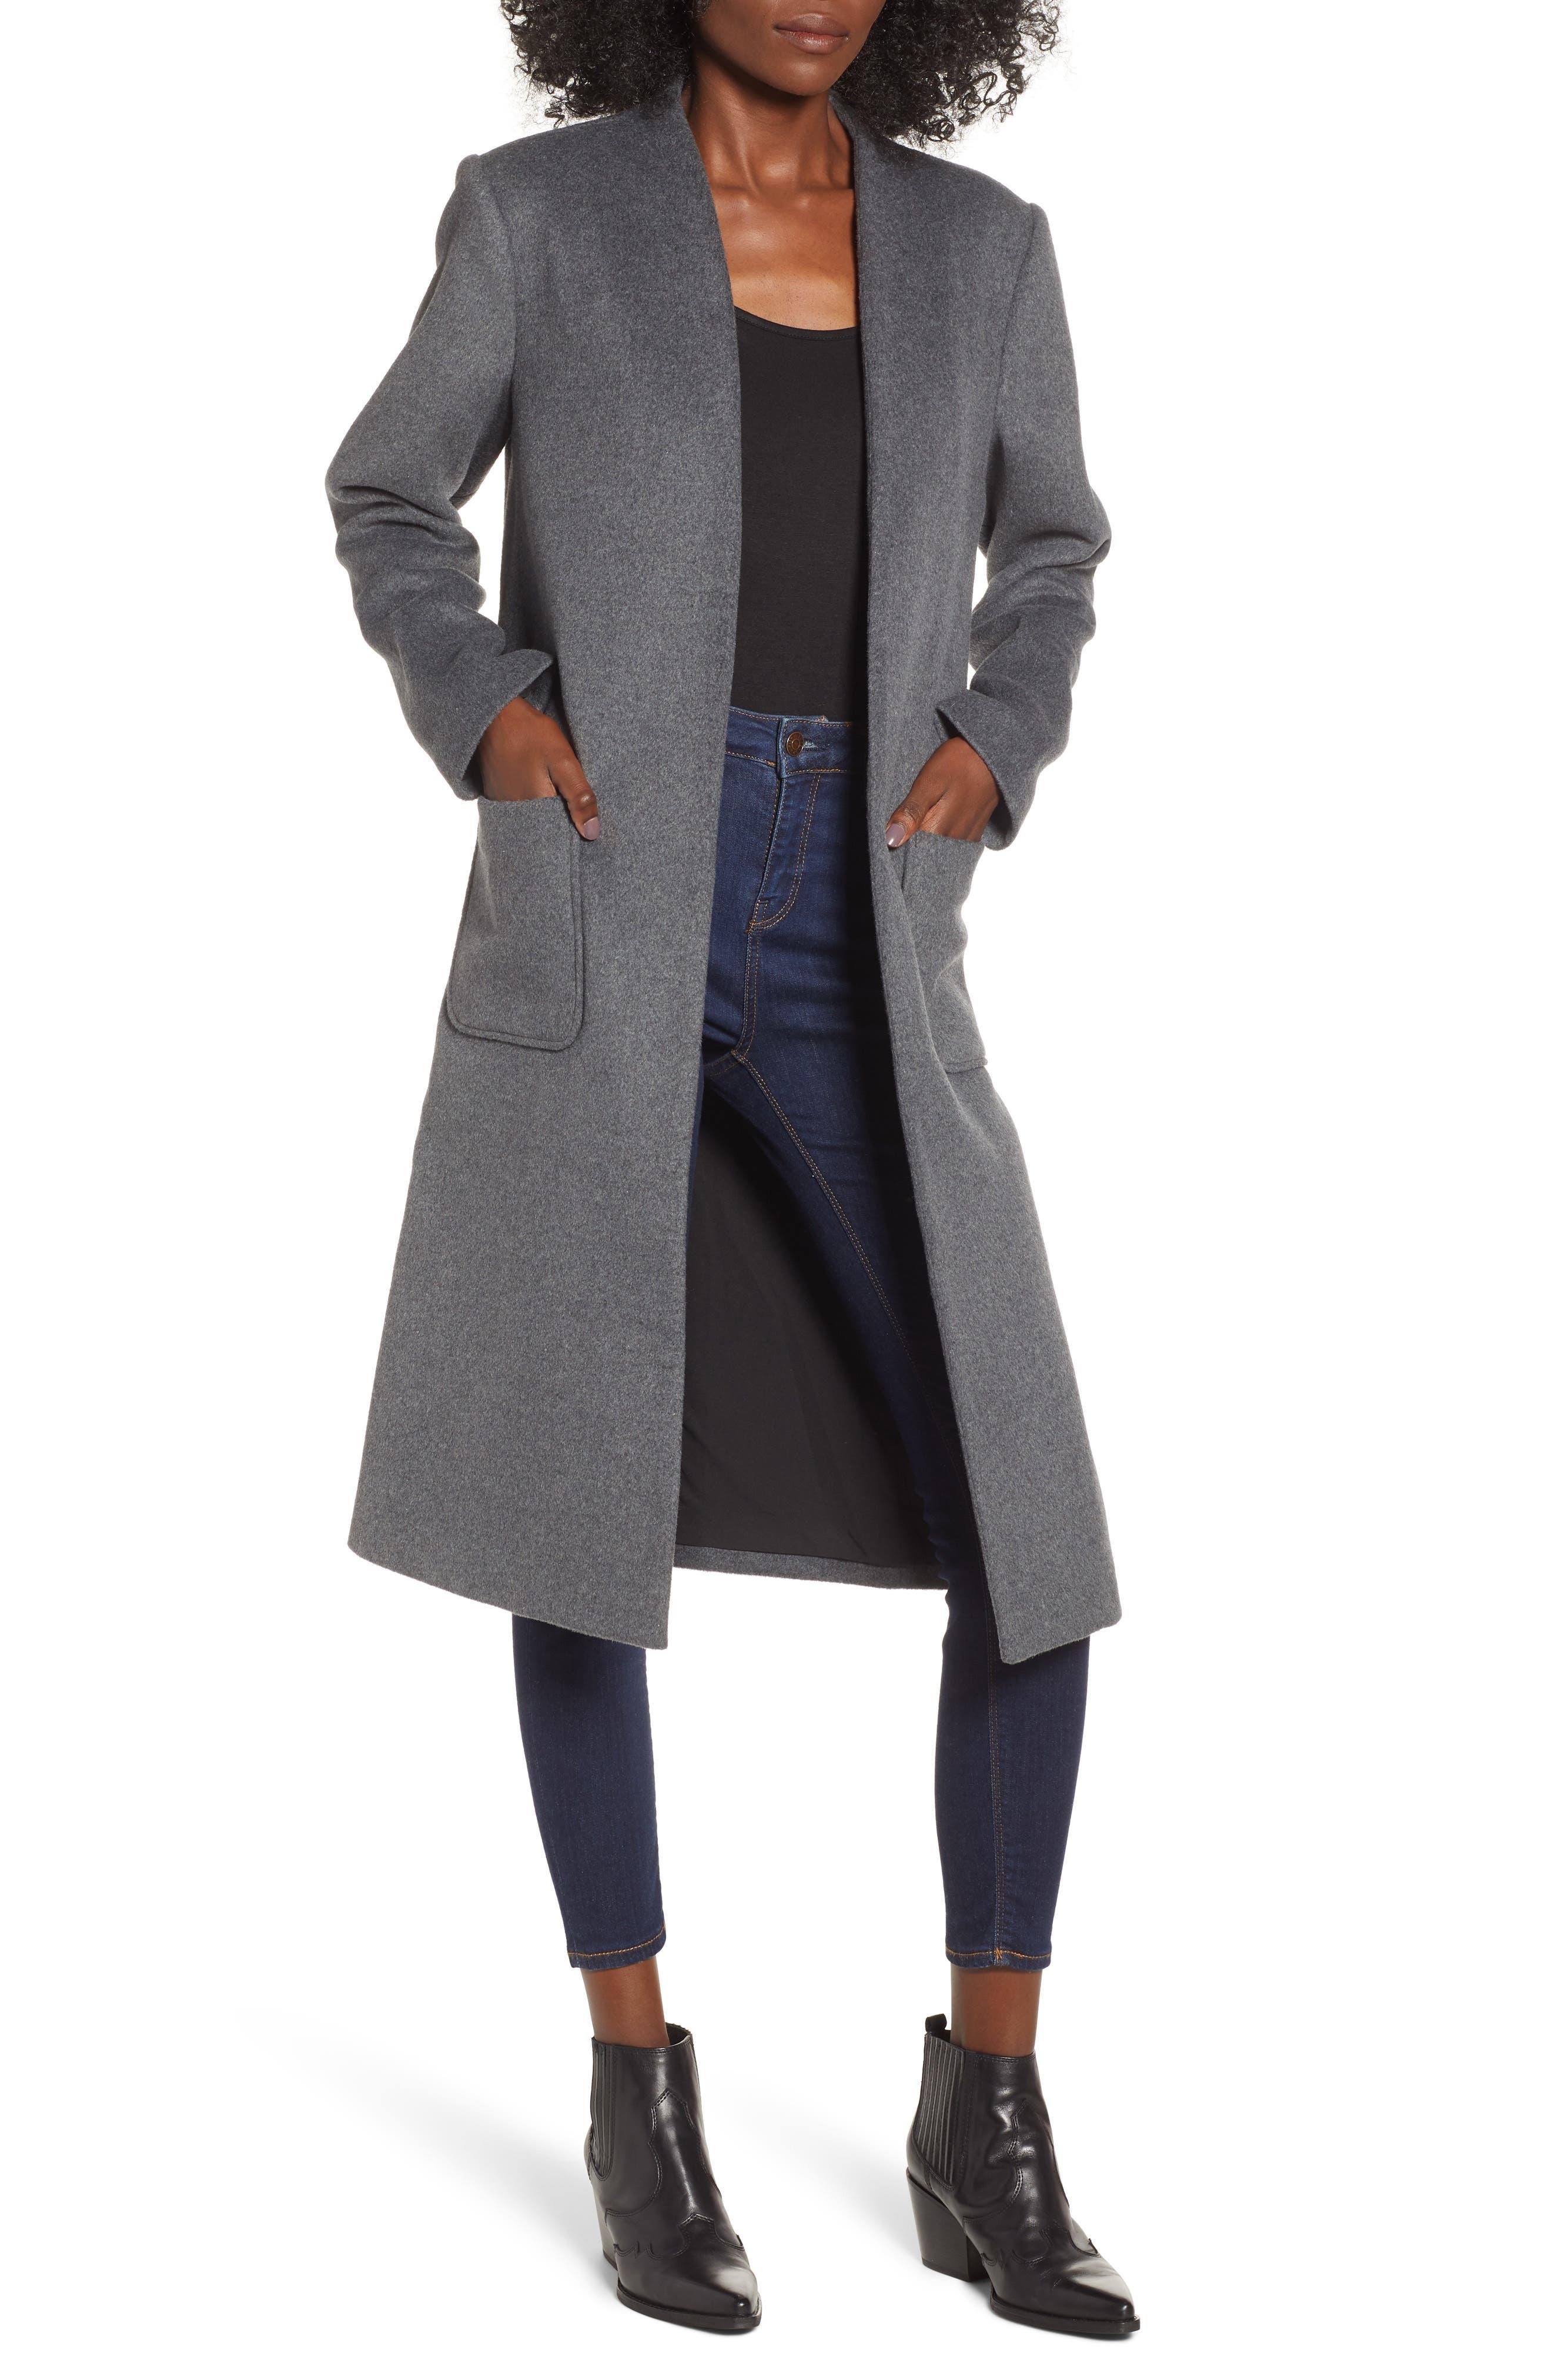 MURAL Long Open Front Coat, Main, color, CHARCOAL GREY